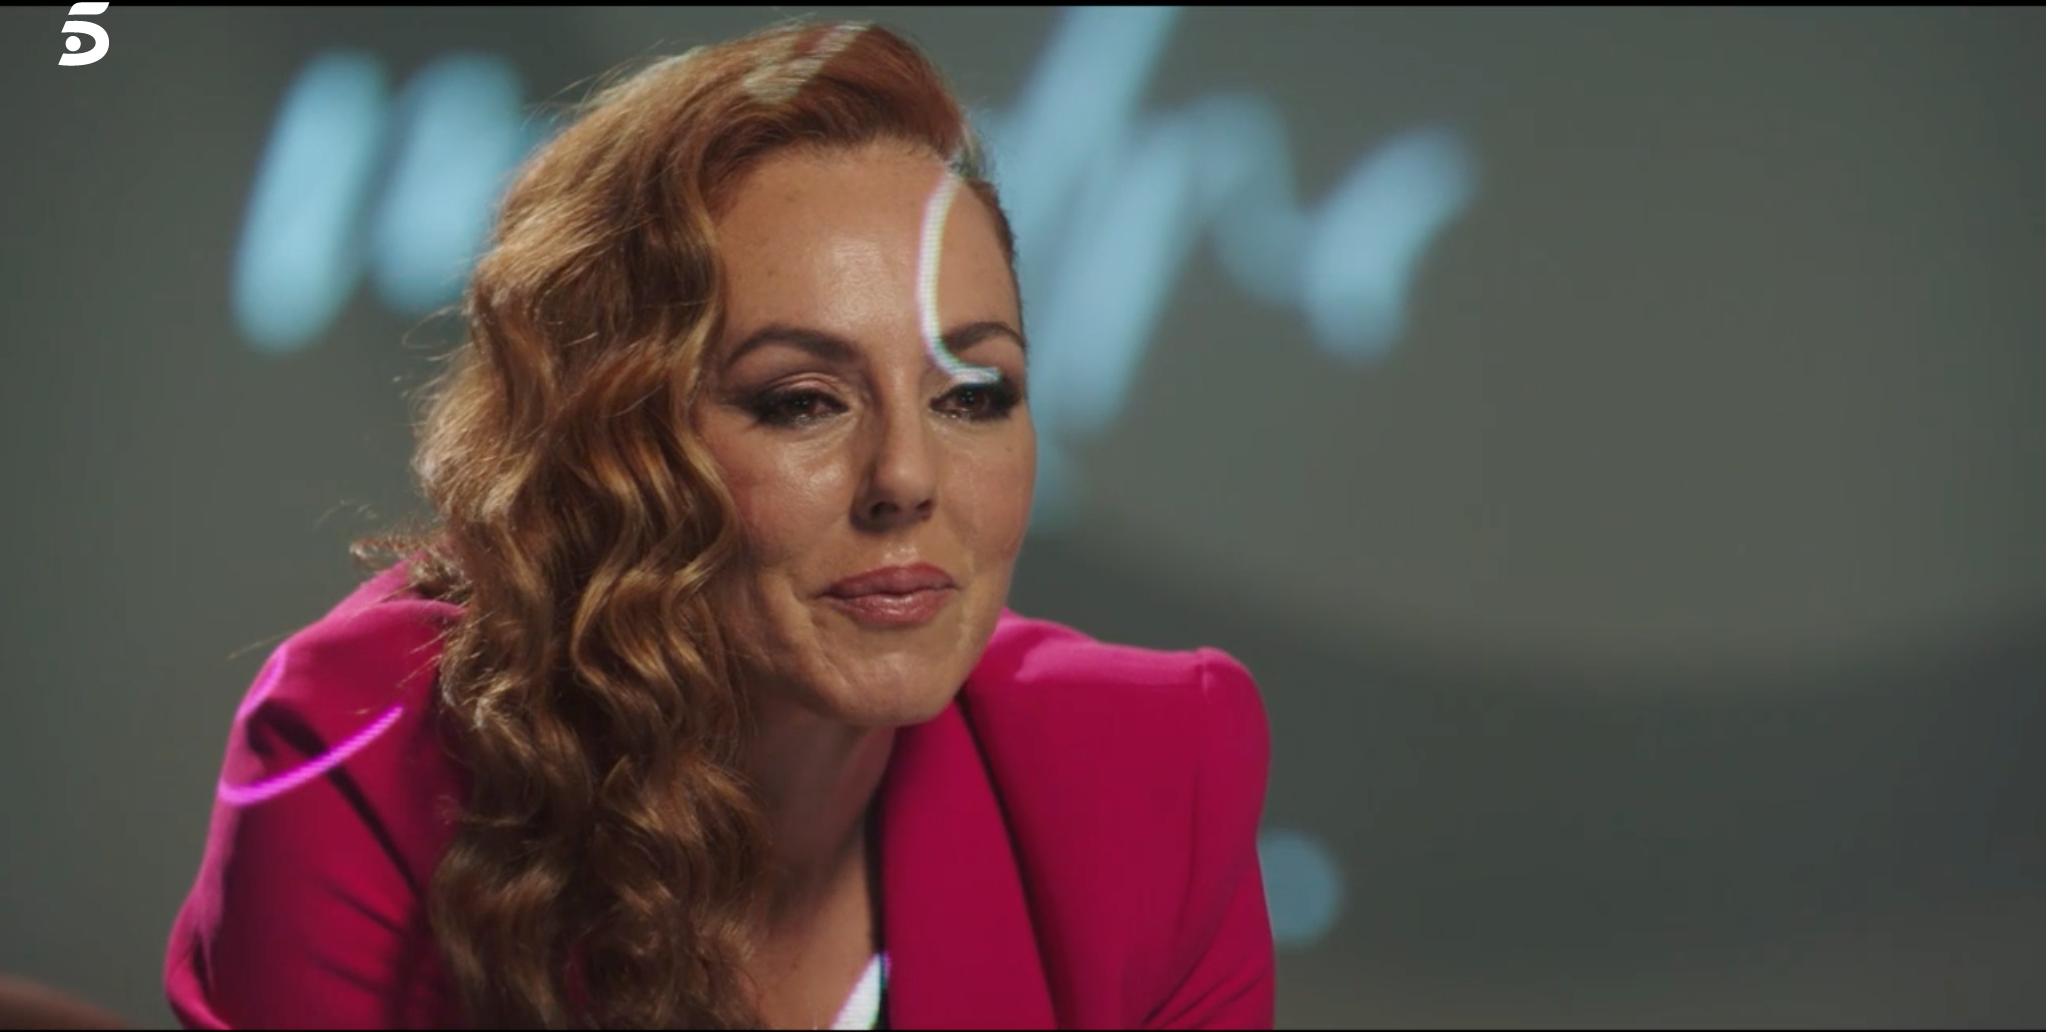 Rocío Carrasco a la sèrie documental sobre la seva vida | Telecinco